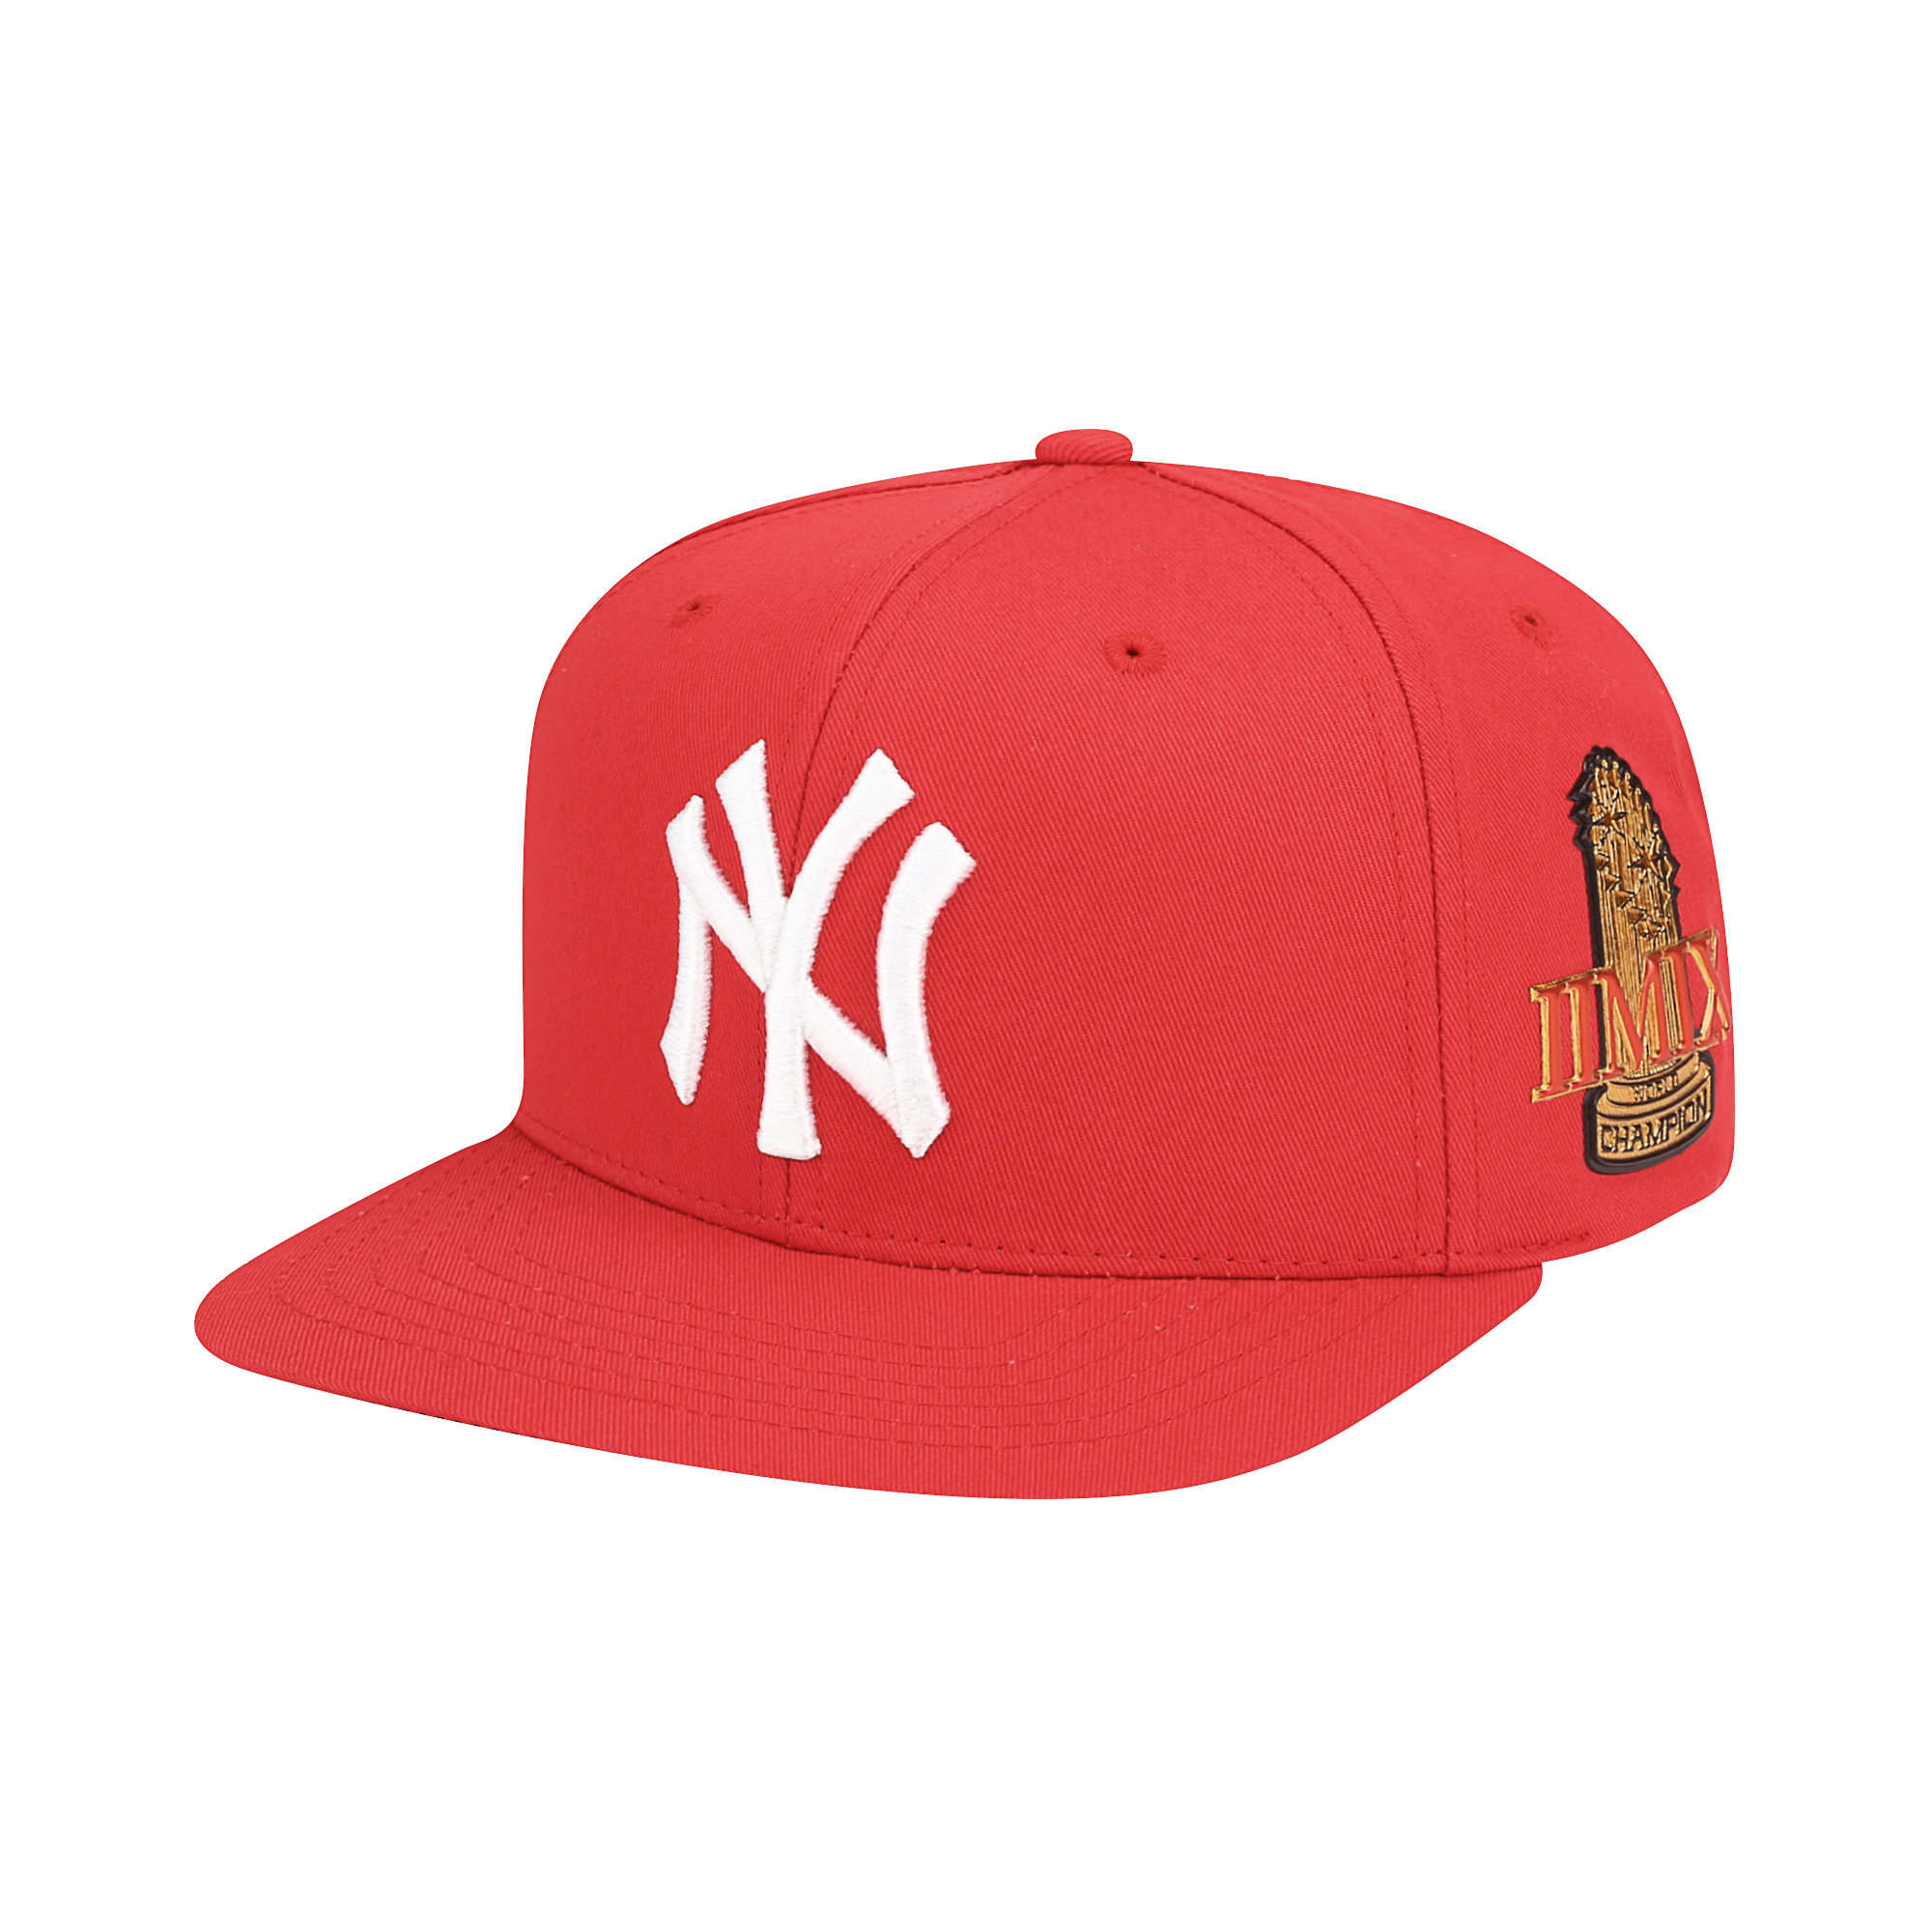 NEW YORK YANKEES CHAMPION SNAPBACK